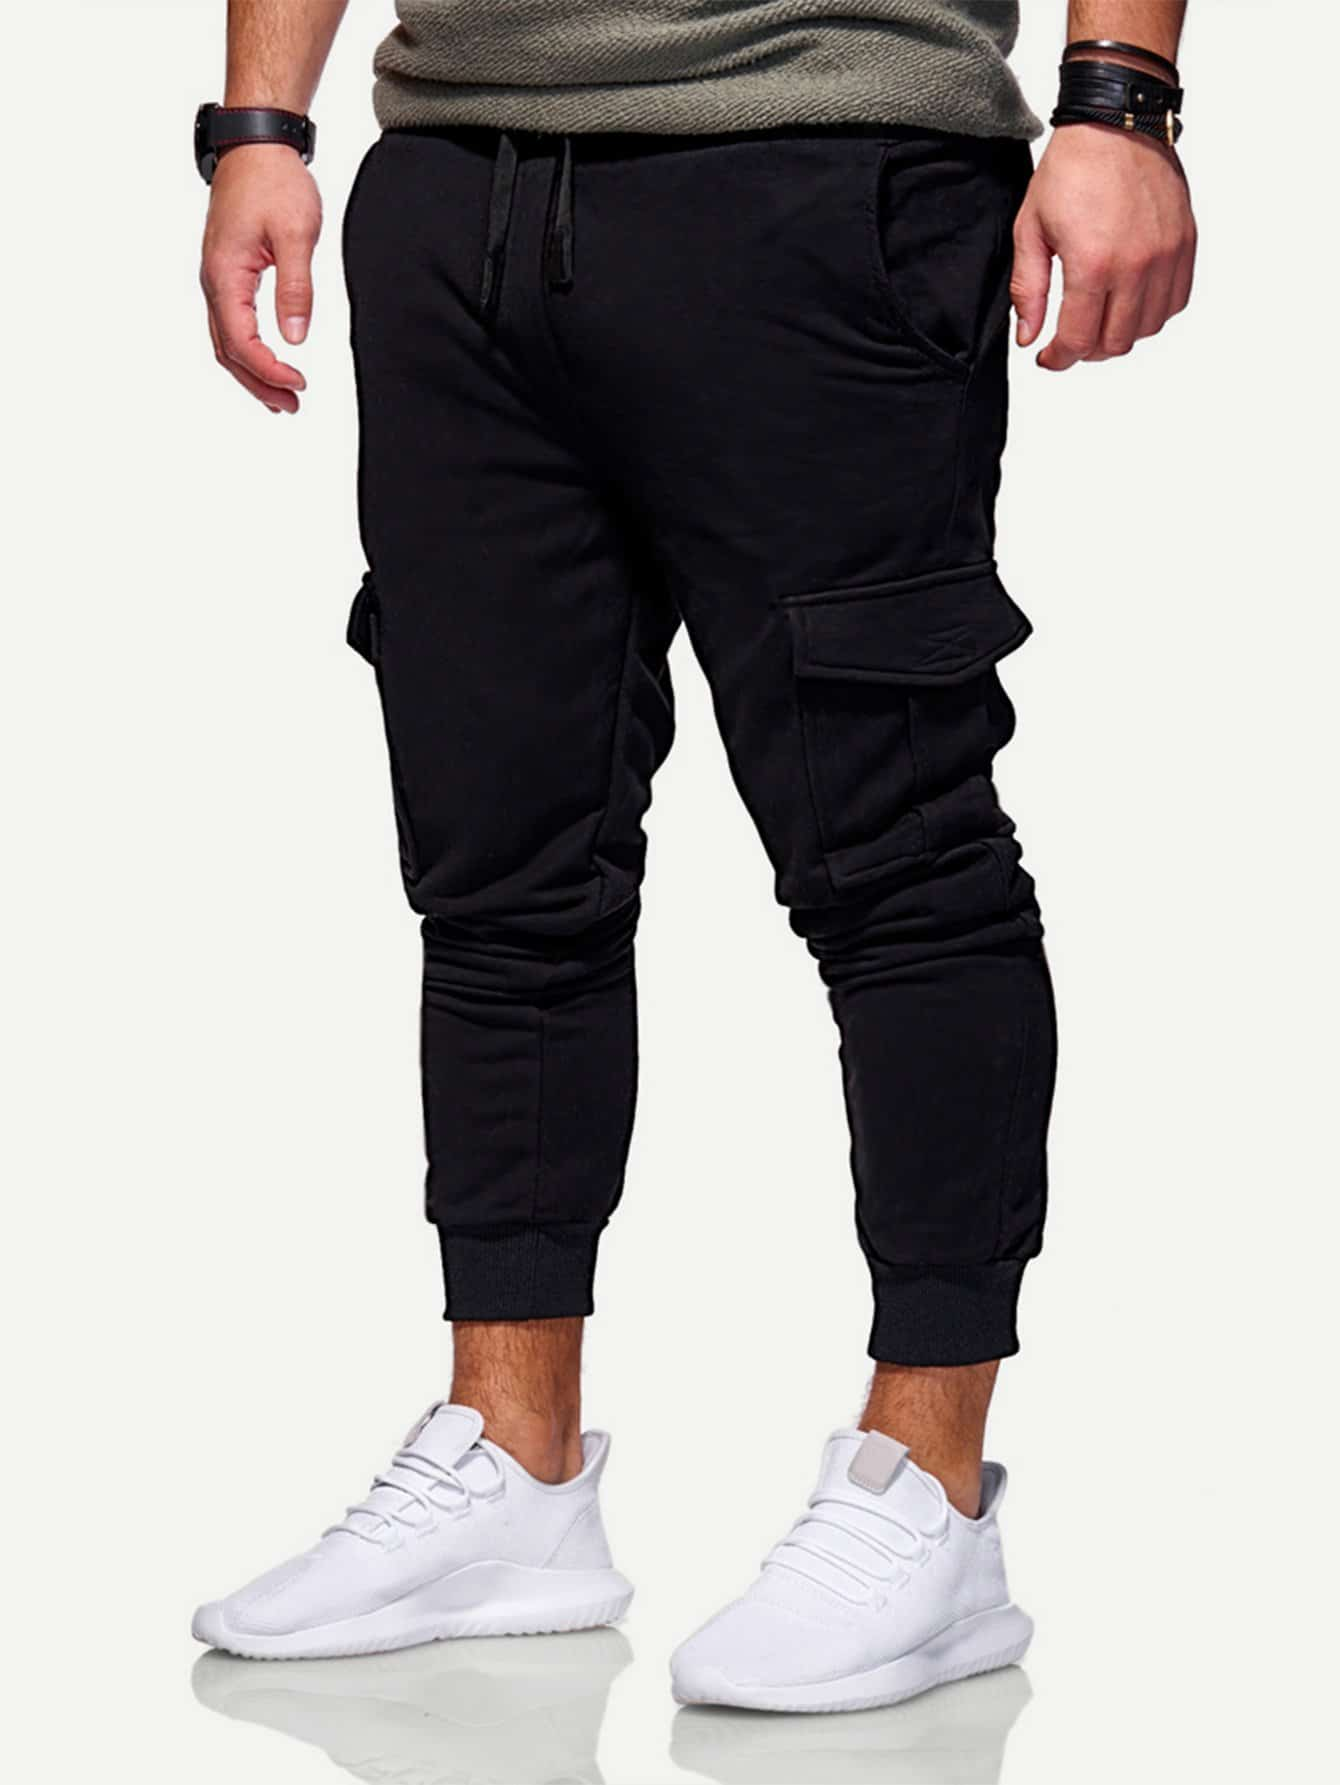 Men Solid Pockets Decoration Drawstring Pants